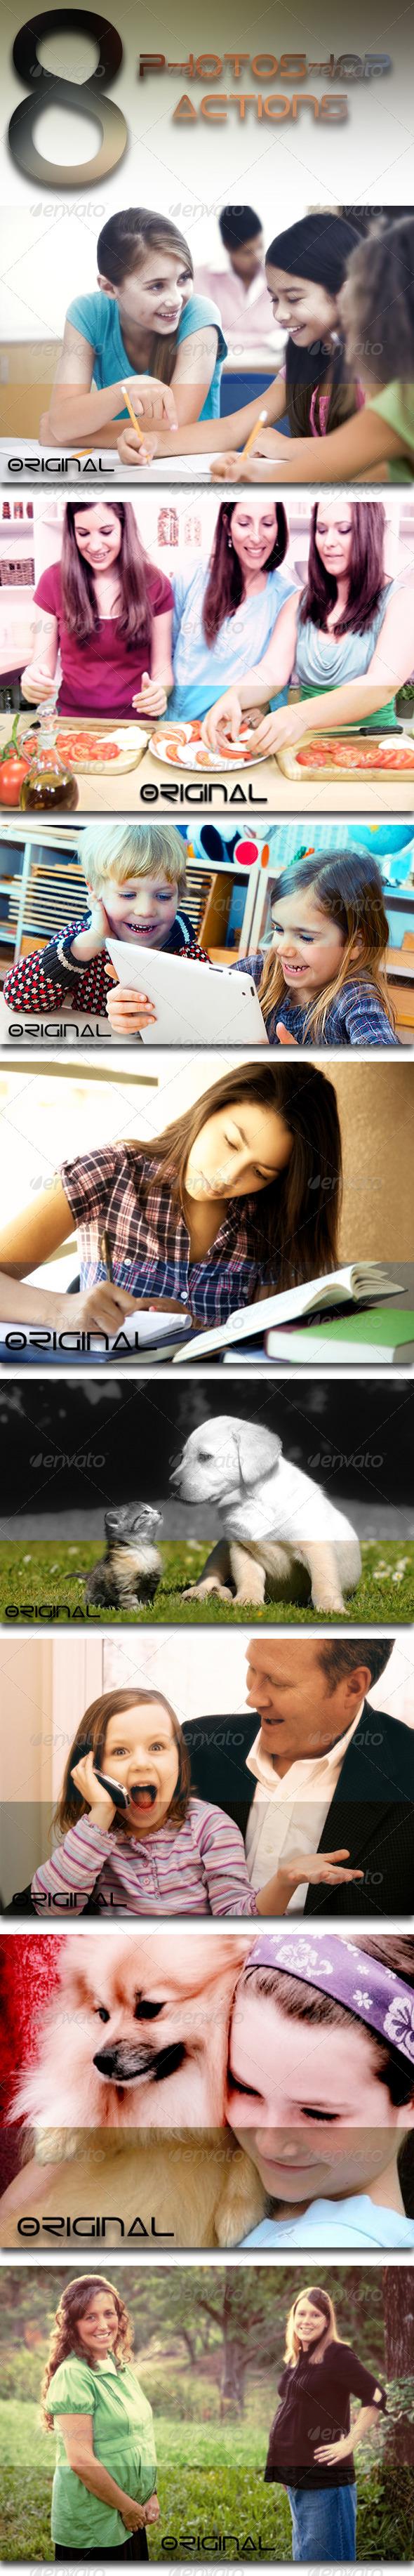 GraphicRiver 8 Photoshop Actions 7602539